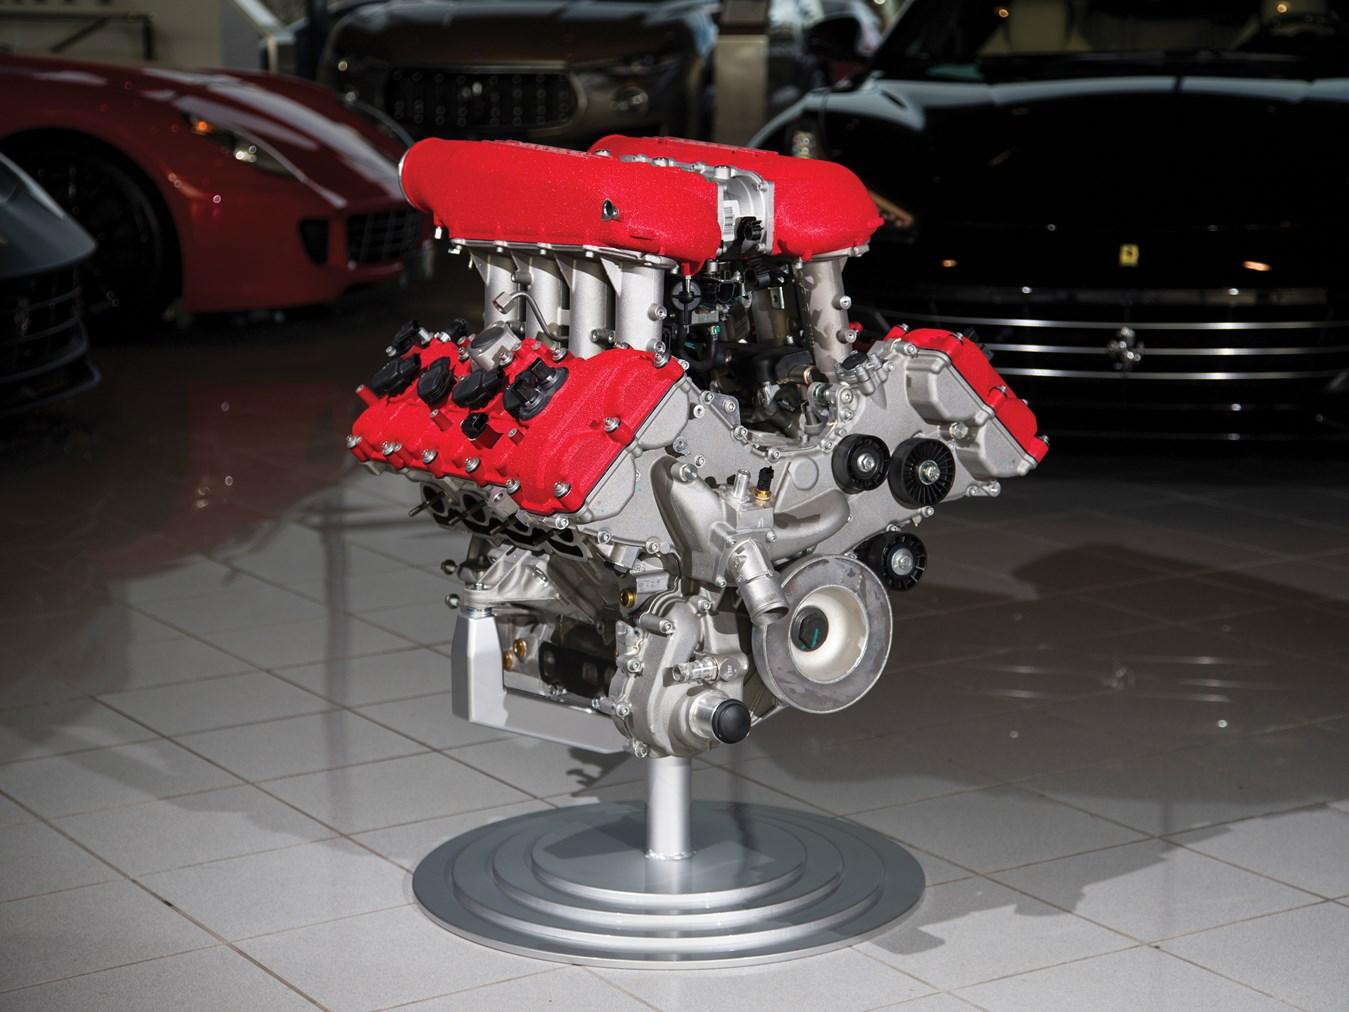 Ferrari 458 Italia Engine with Stand